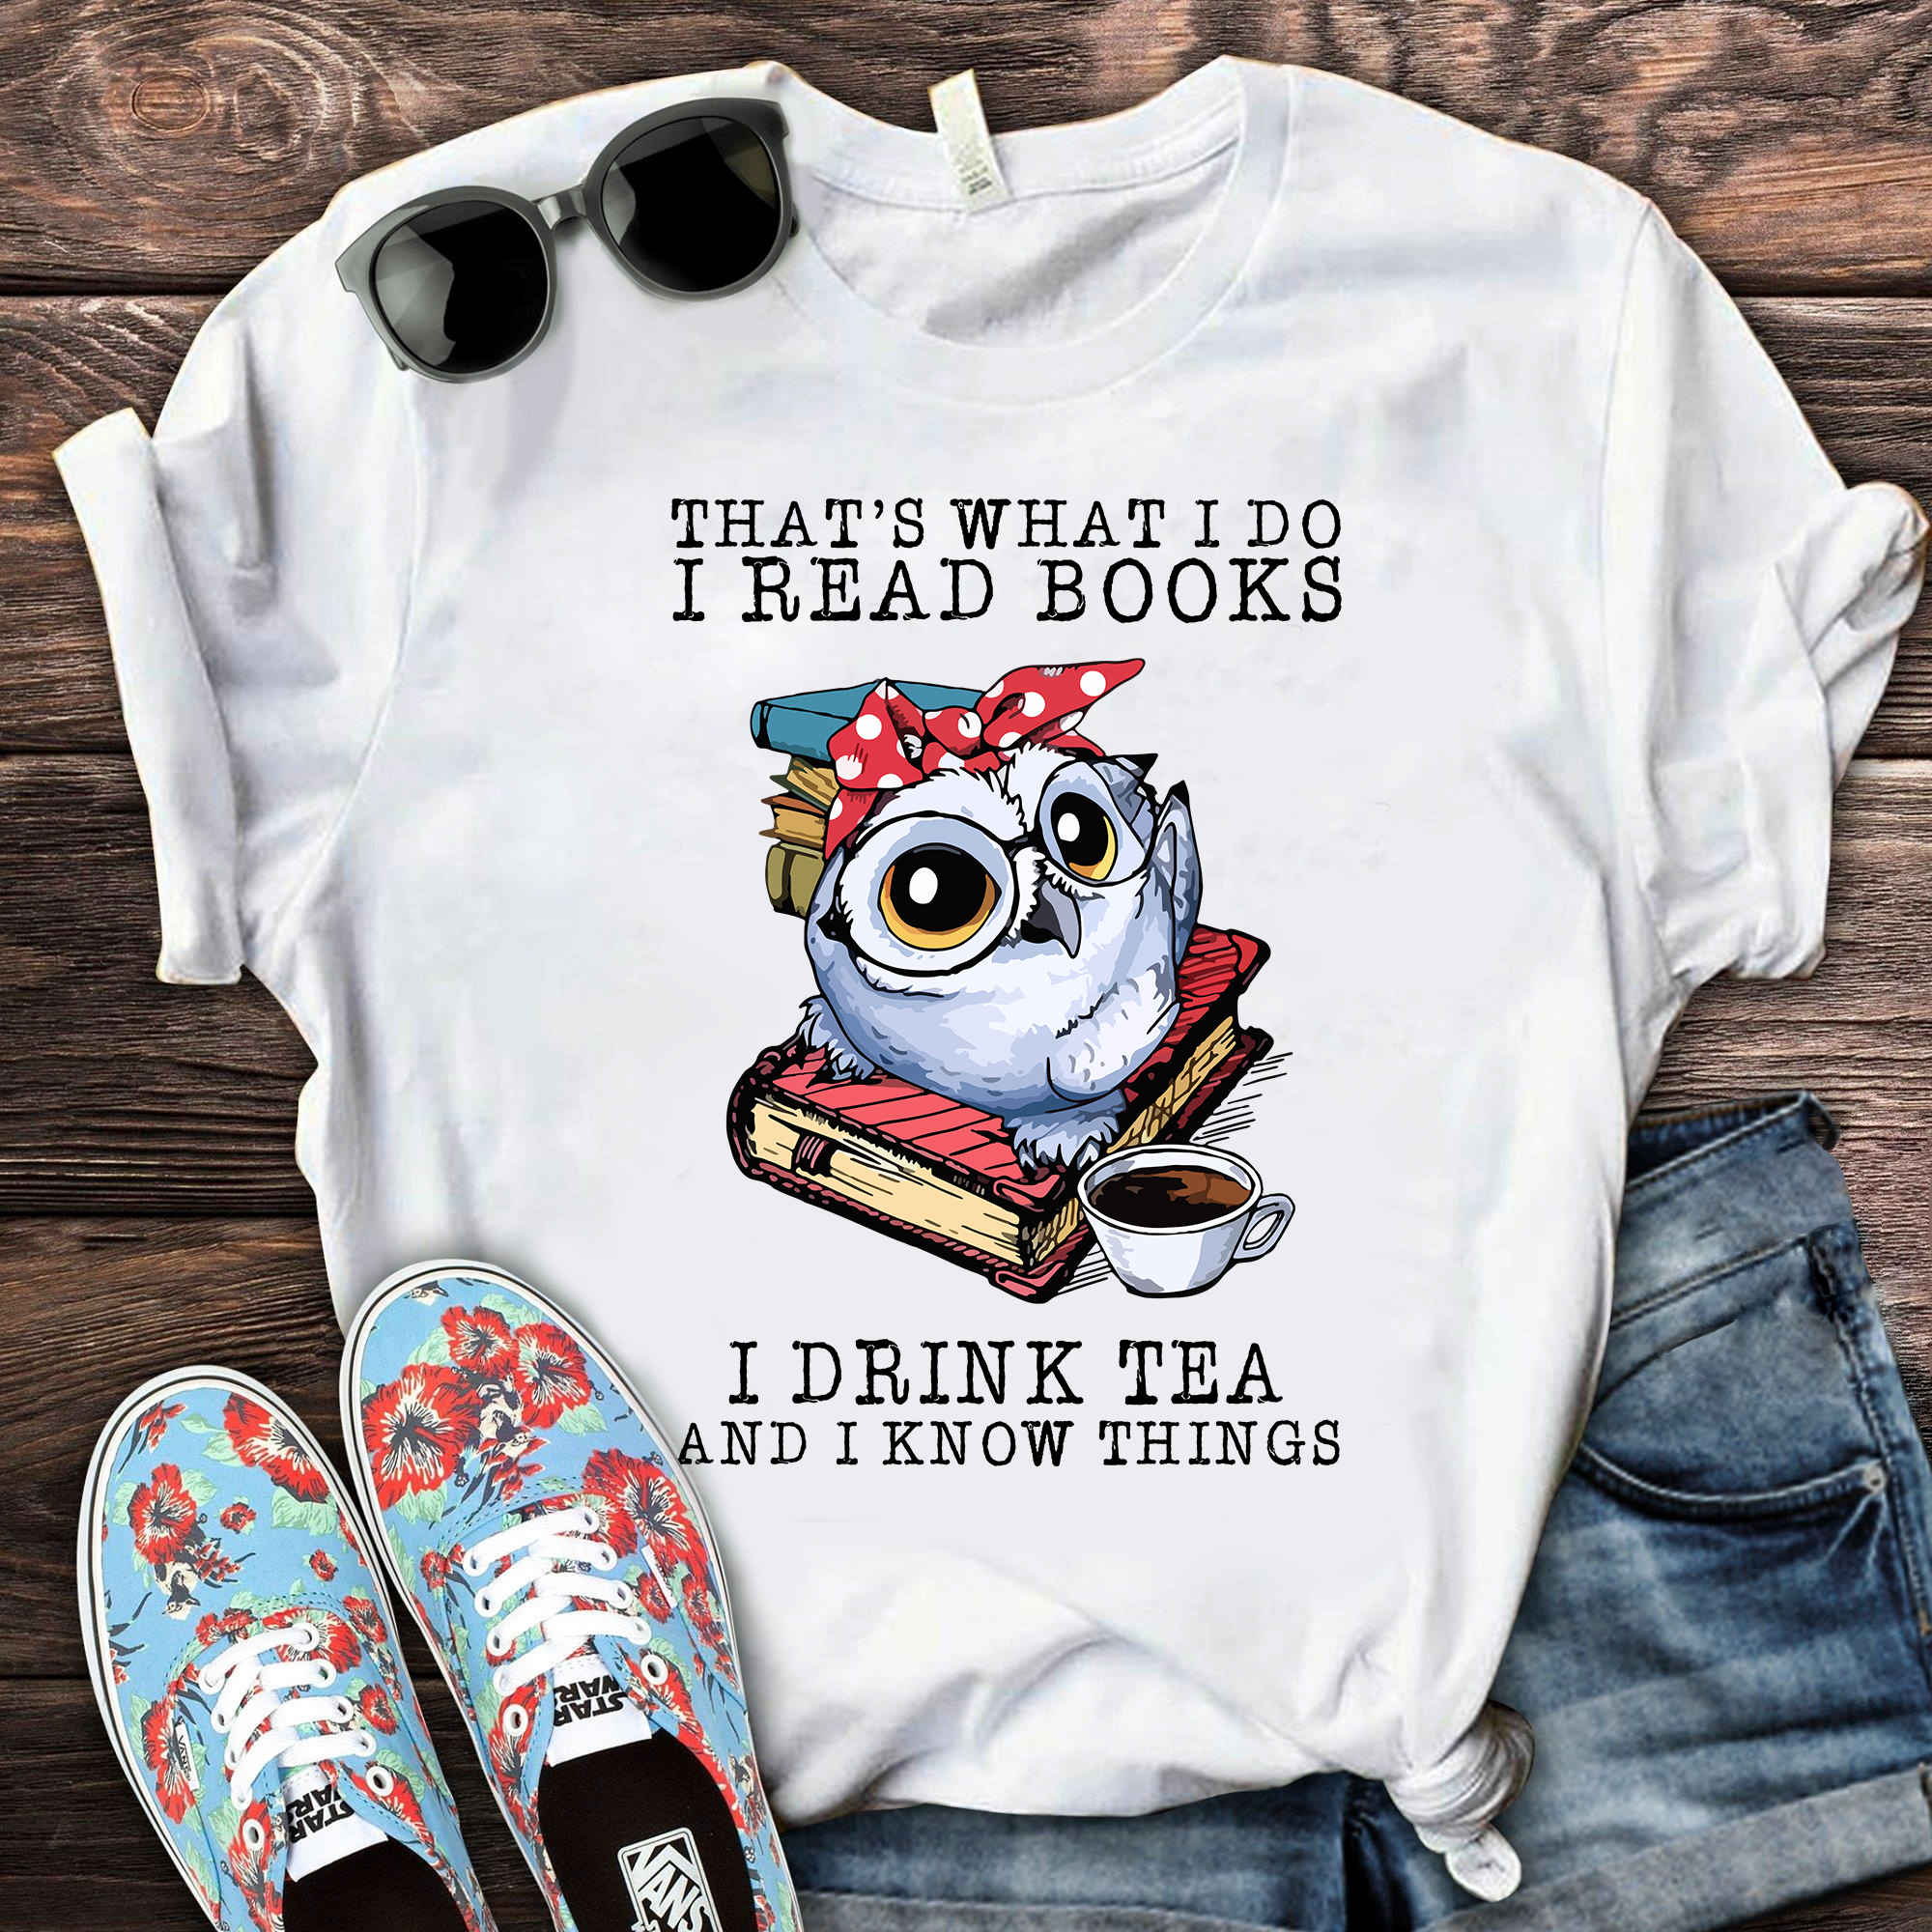 Book Shirt Owl Red Bandana Read Books Drink Tea